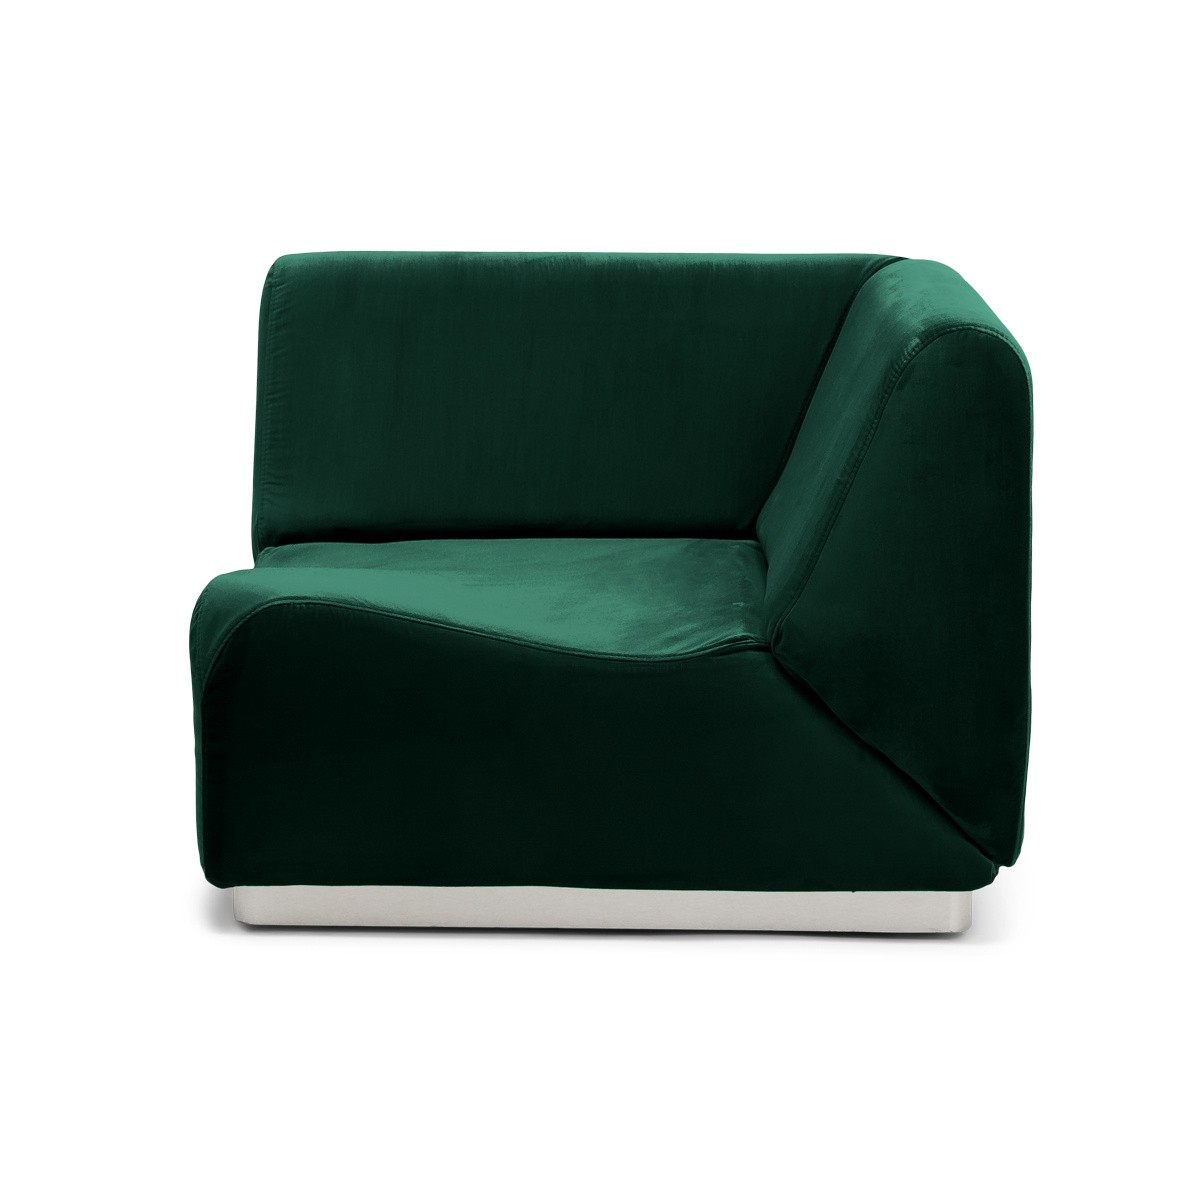 Module d'angle Rotondo velours vert sapin